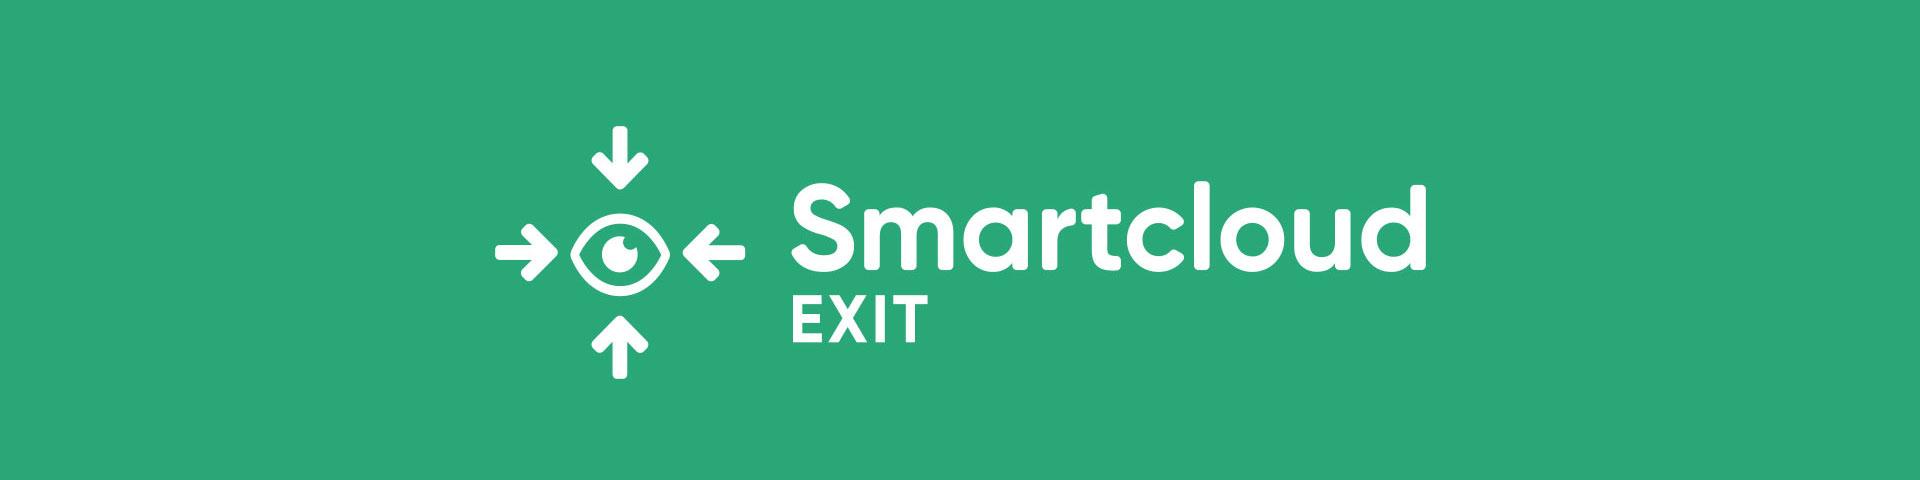 post smartcloud exit 1